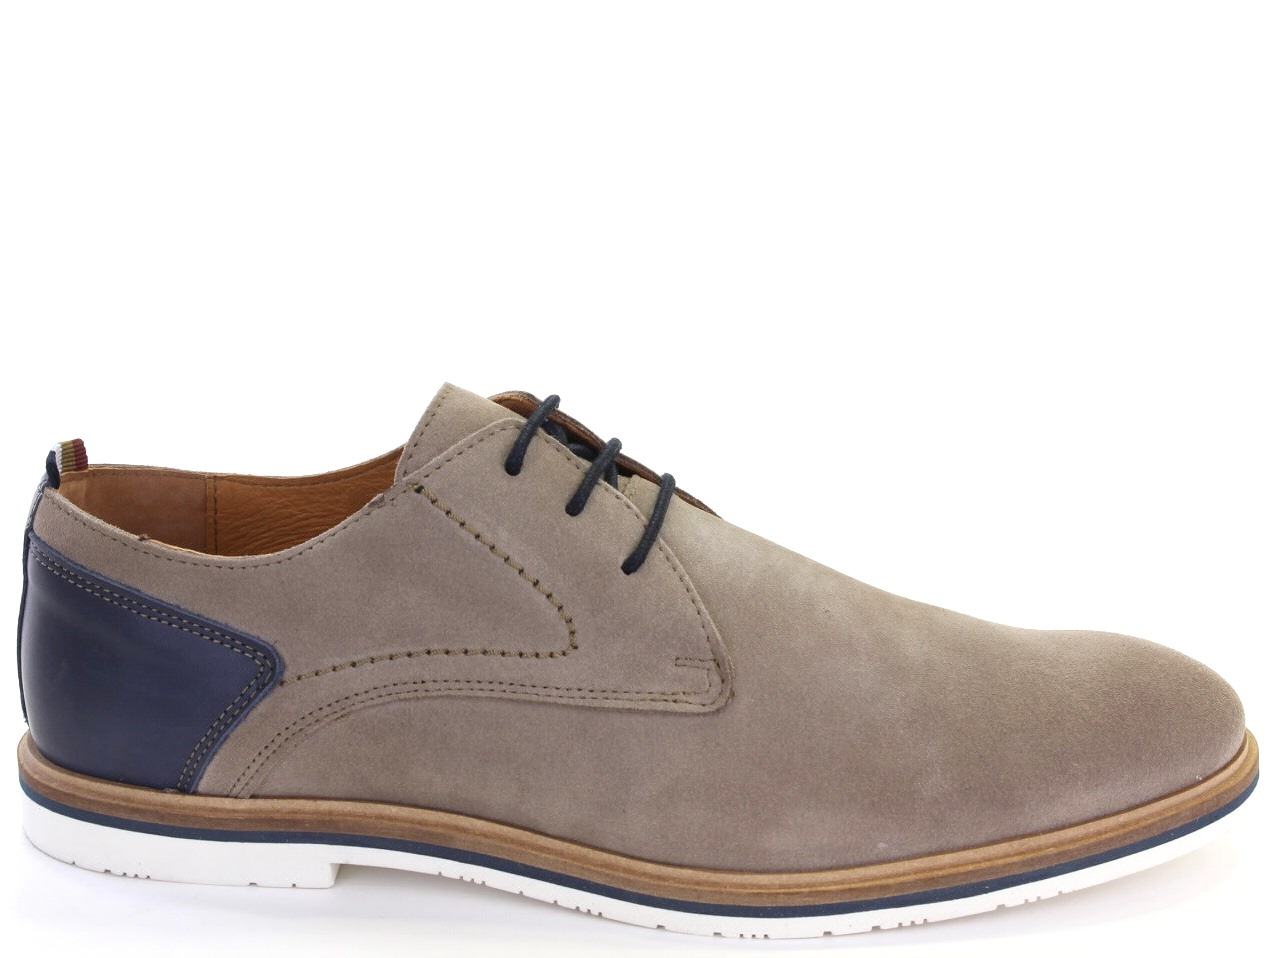 Casual Shoes Glispe - 650 1210336